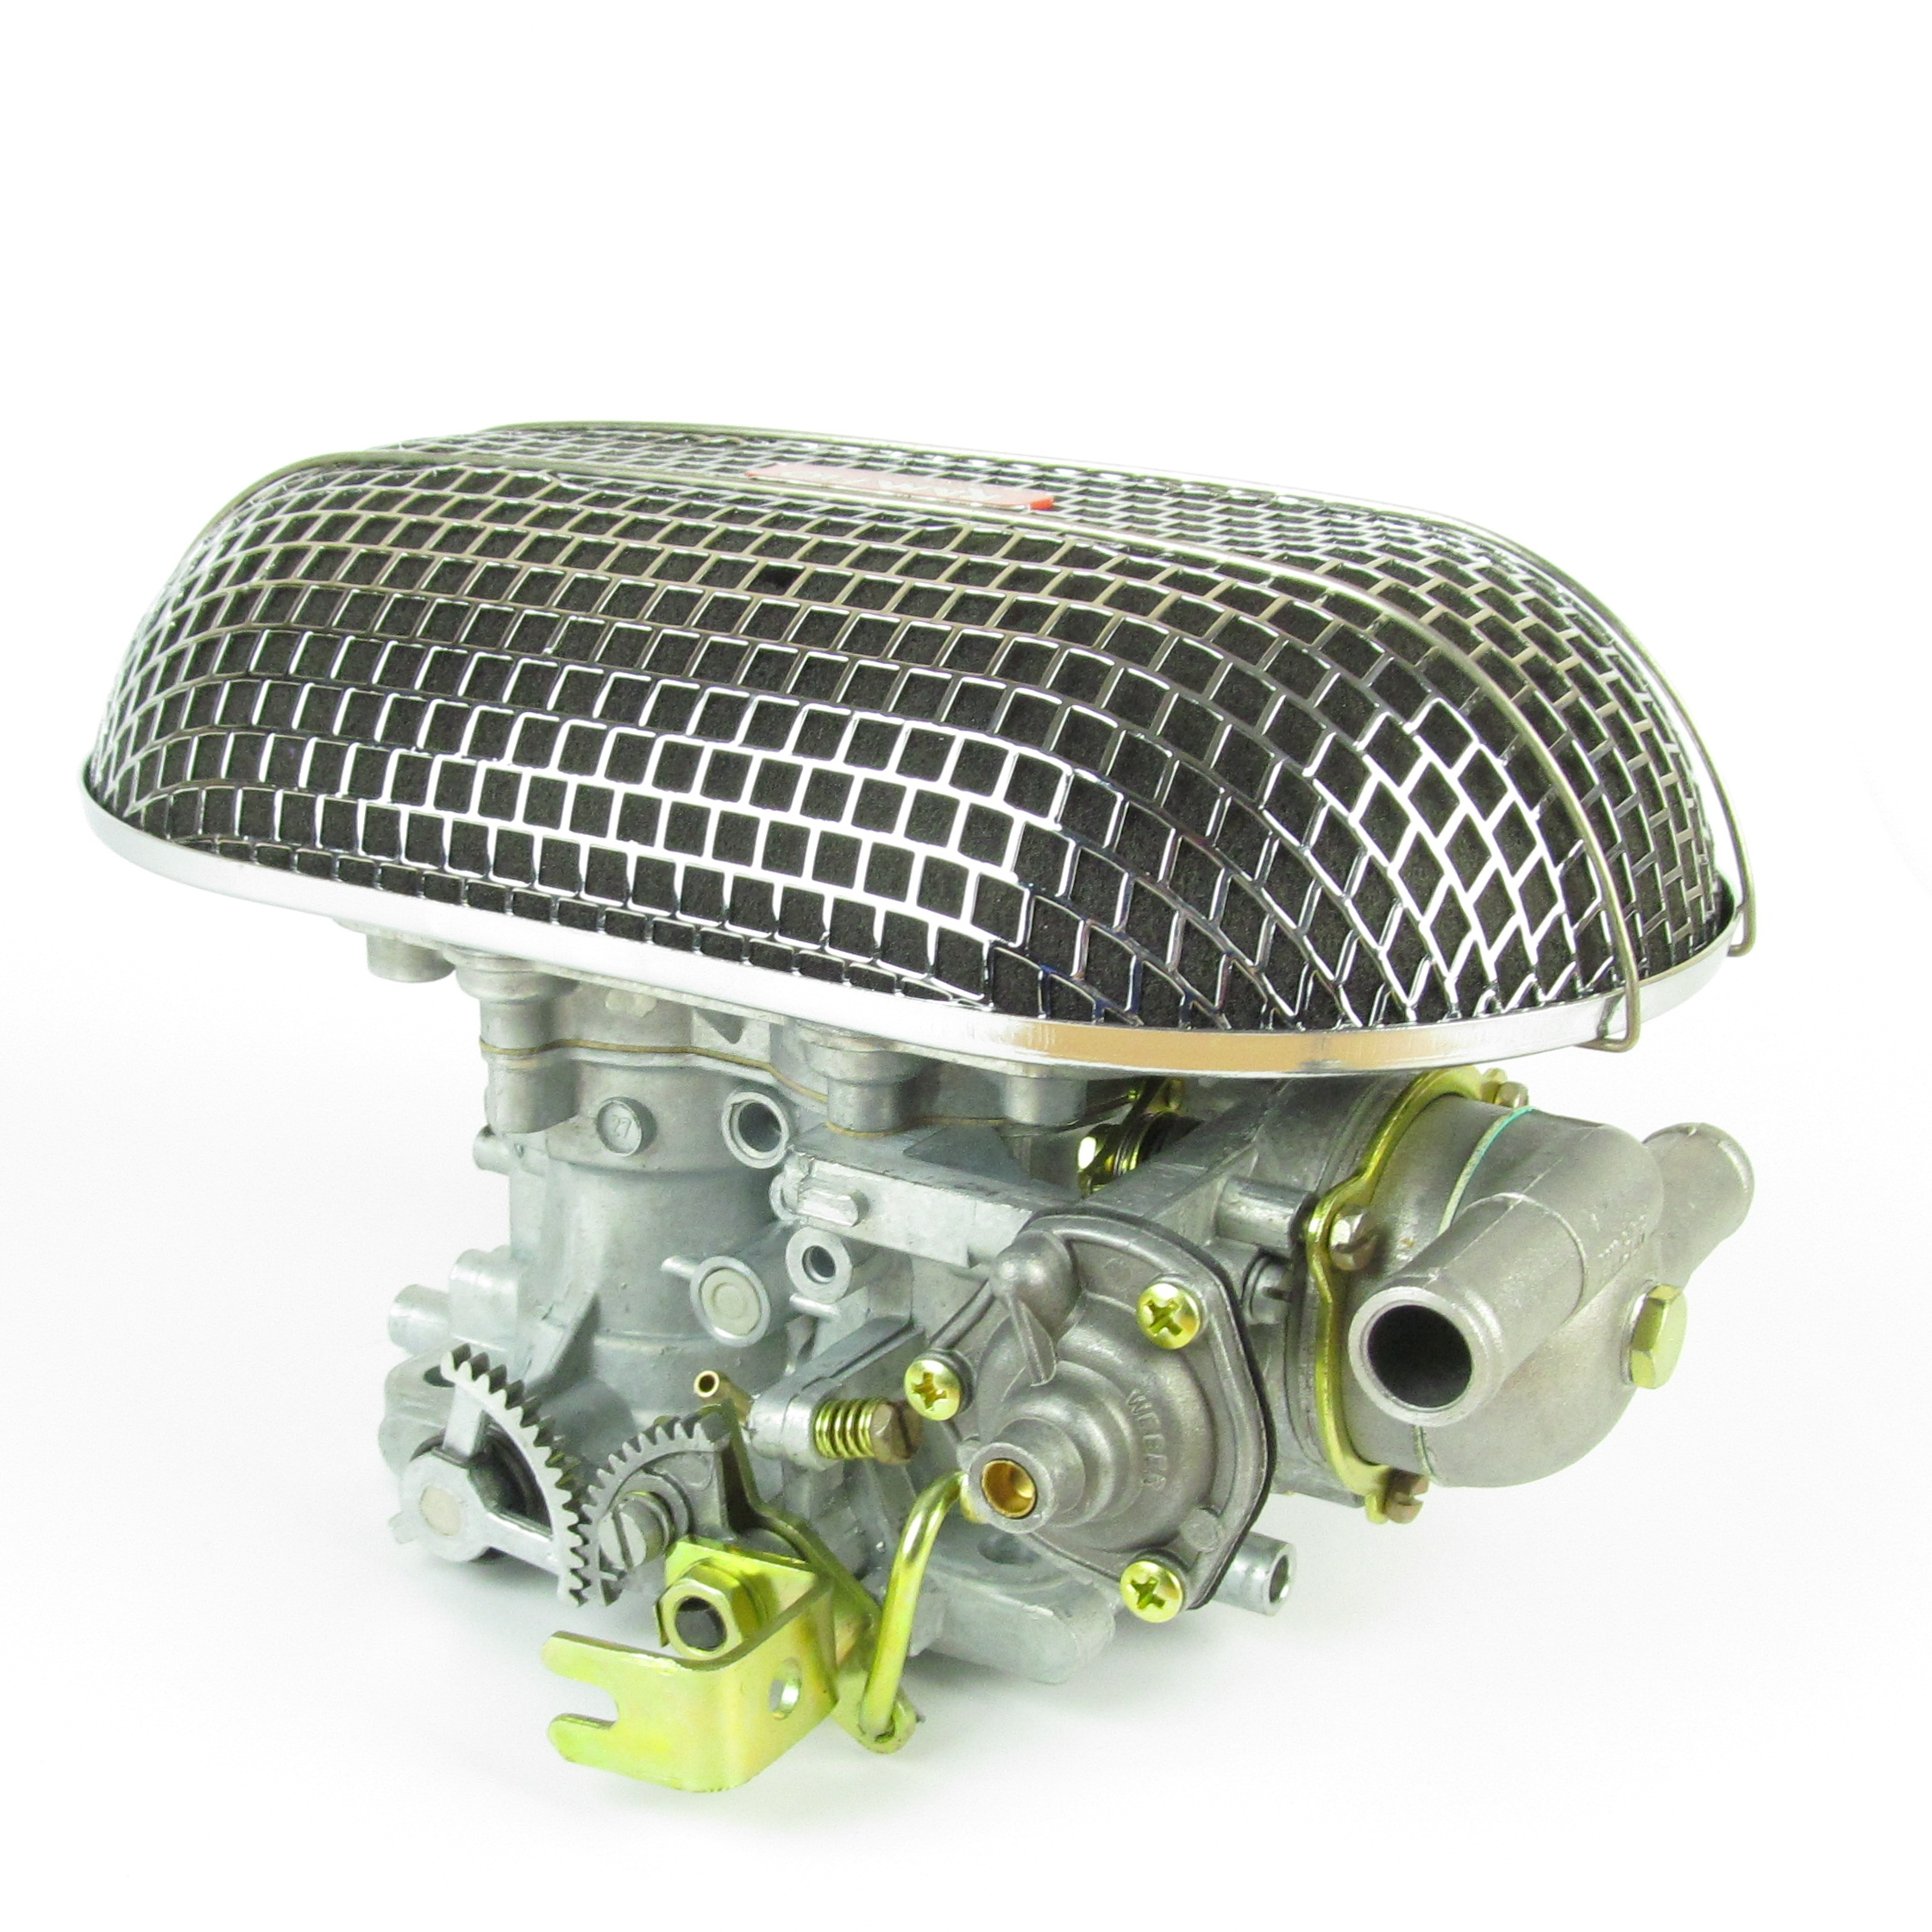 WEBER 32 / 36 DGV / DGAV i amp; 38 DGMS / DGAS TWIN CARBS - LYNX / RAMFLO AIR FILTER